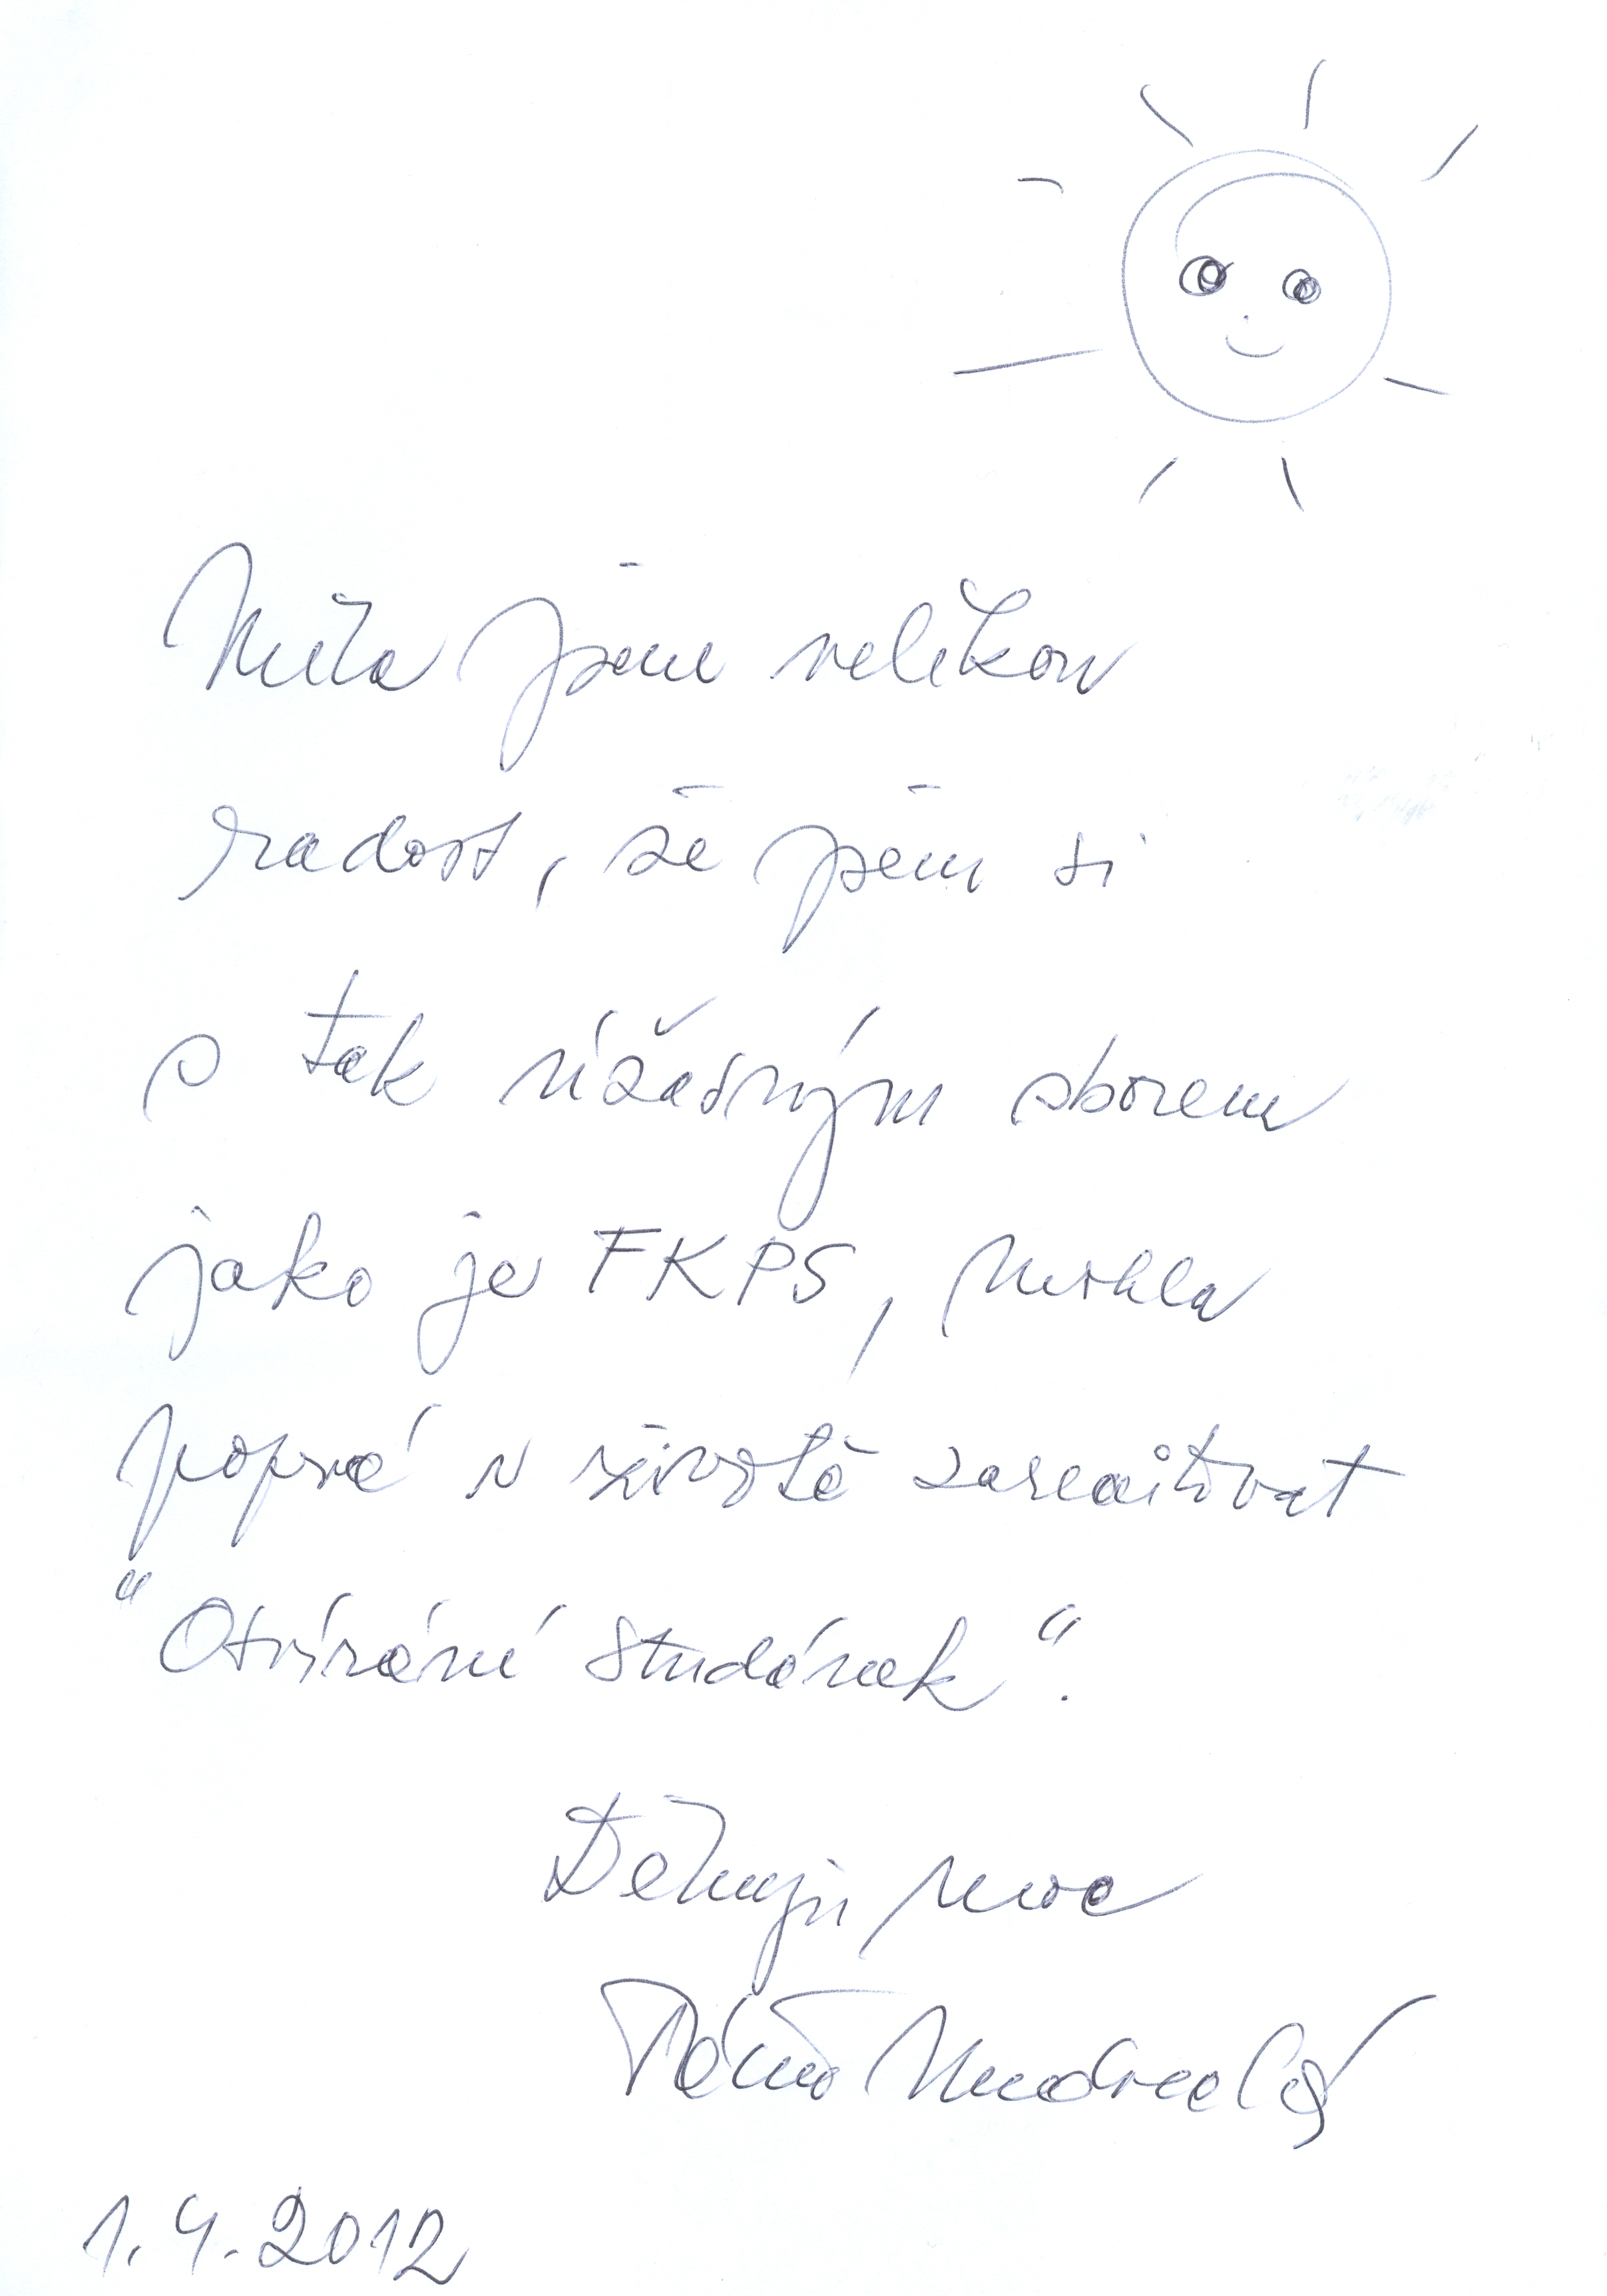 Celeste Yarnall born July 26, 1944 (age 74),Gene Lockhart Erotic pic Carmen Osbahr,Christy Chung